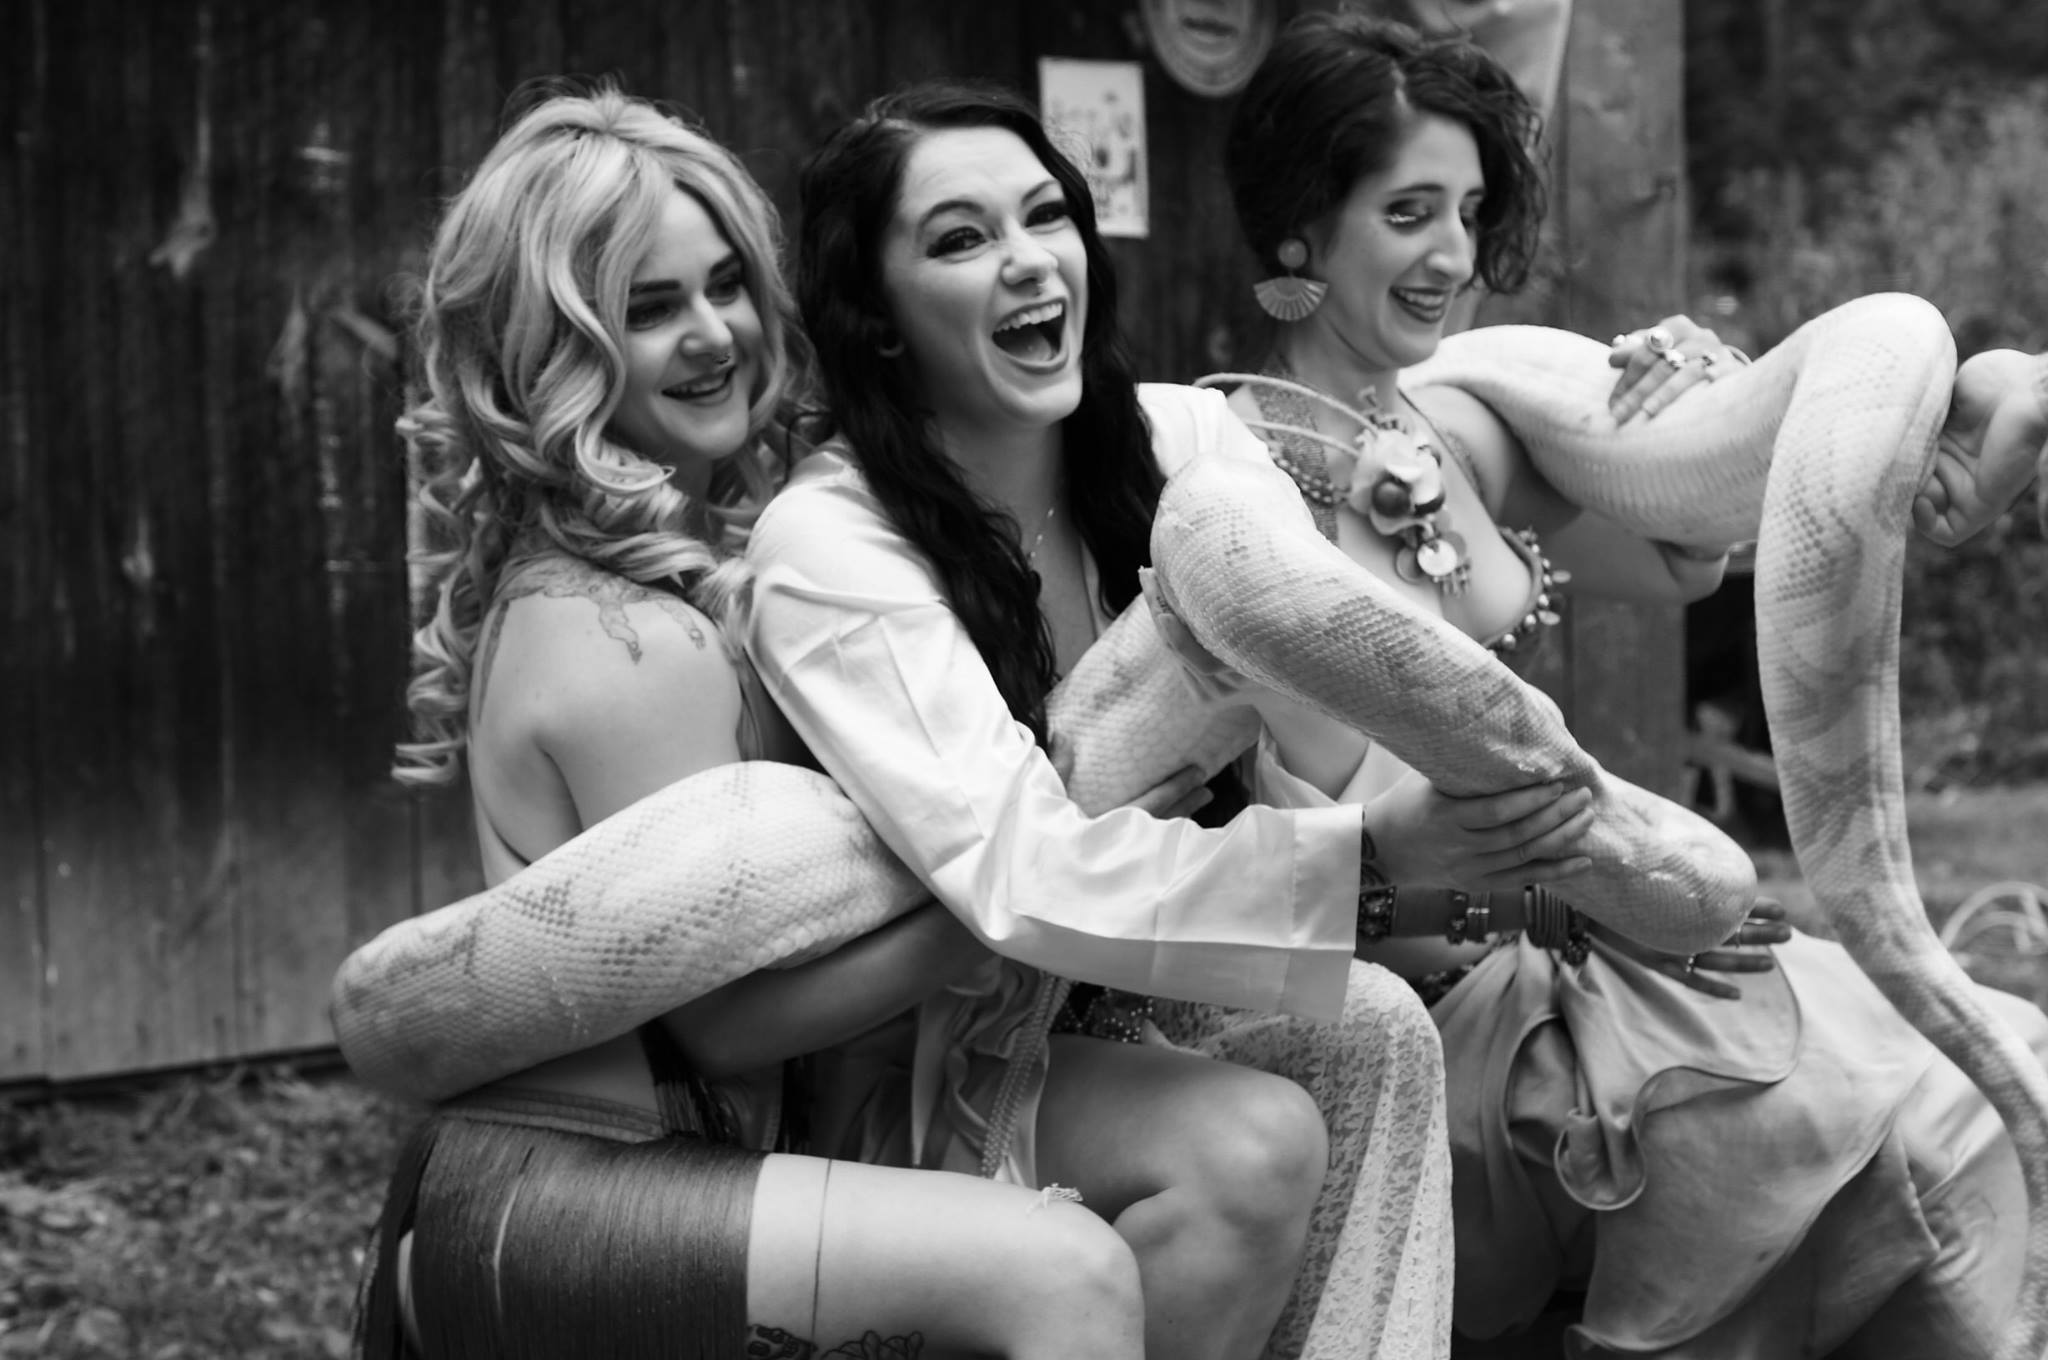 From Left: Amanda Clark, Elaina Carrell, and Pia Louise Capaldi